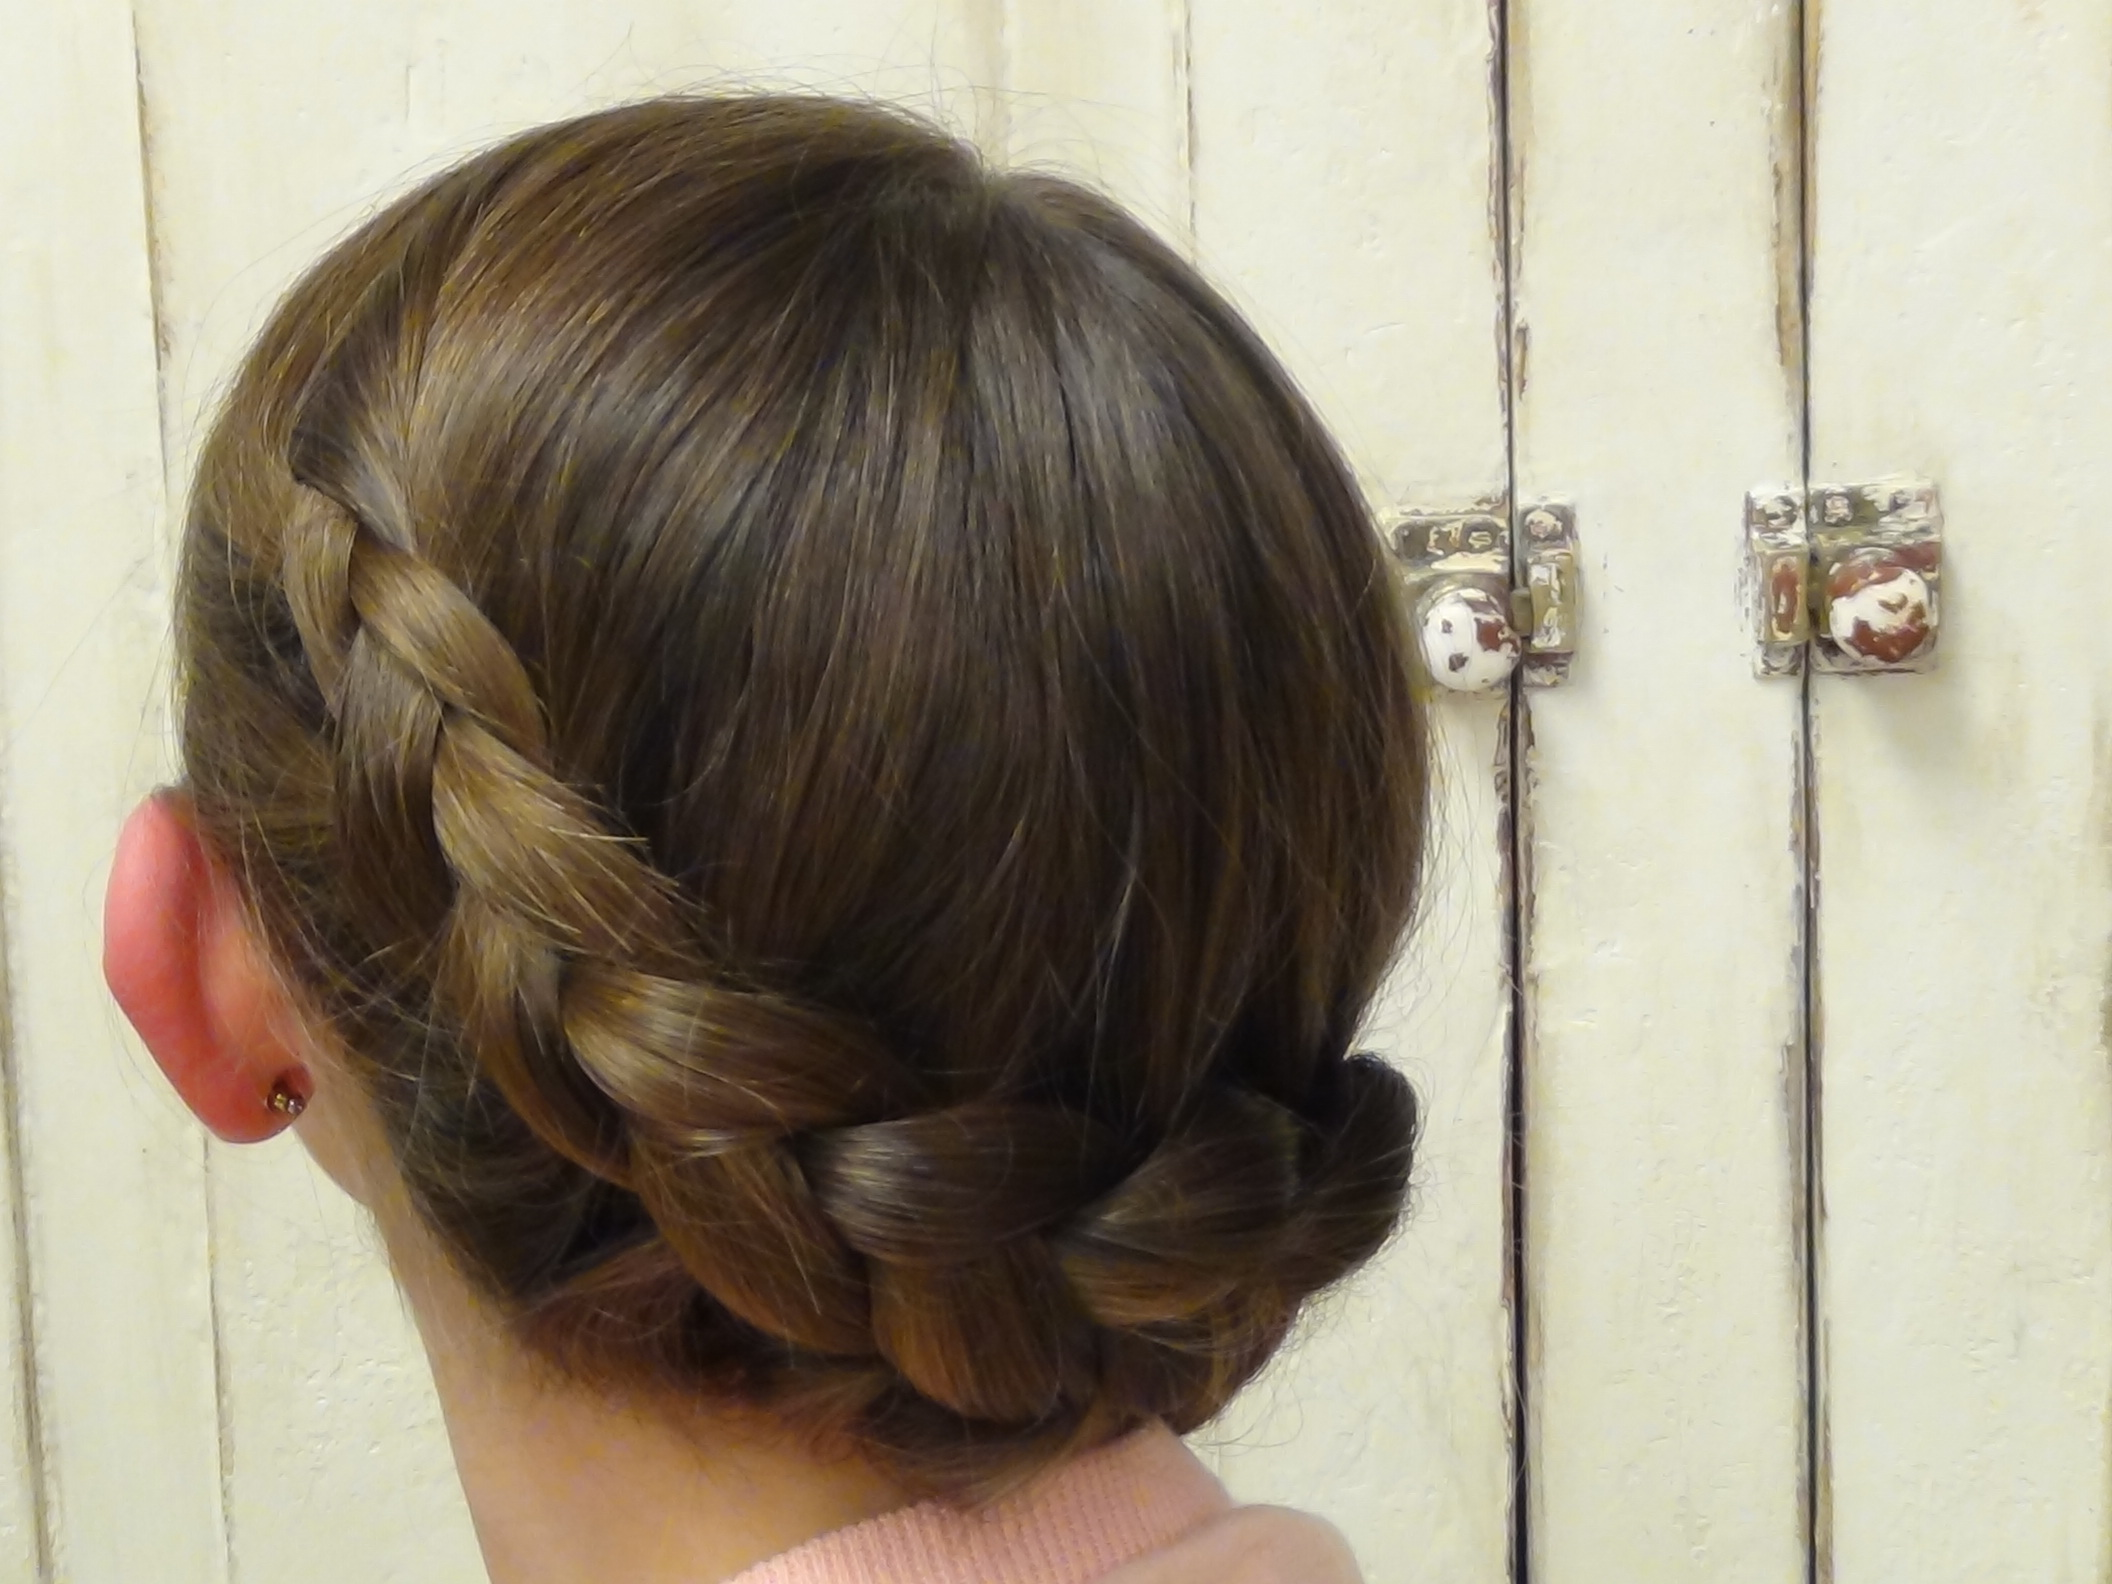 katy perry hairstyle : Pics Photos - Katniss Everdeen Braid News